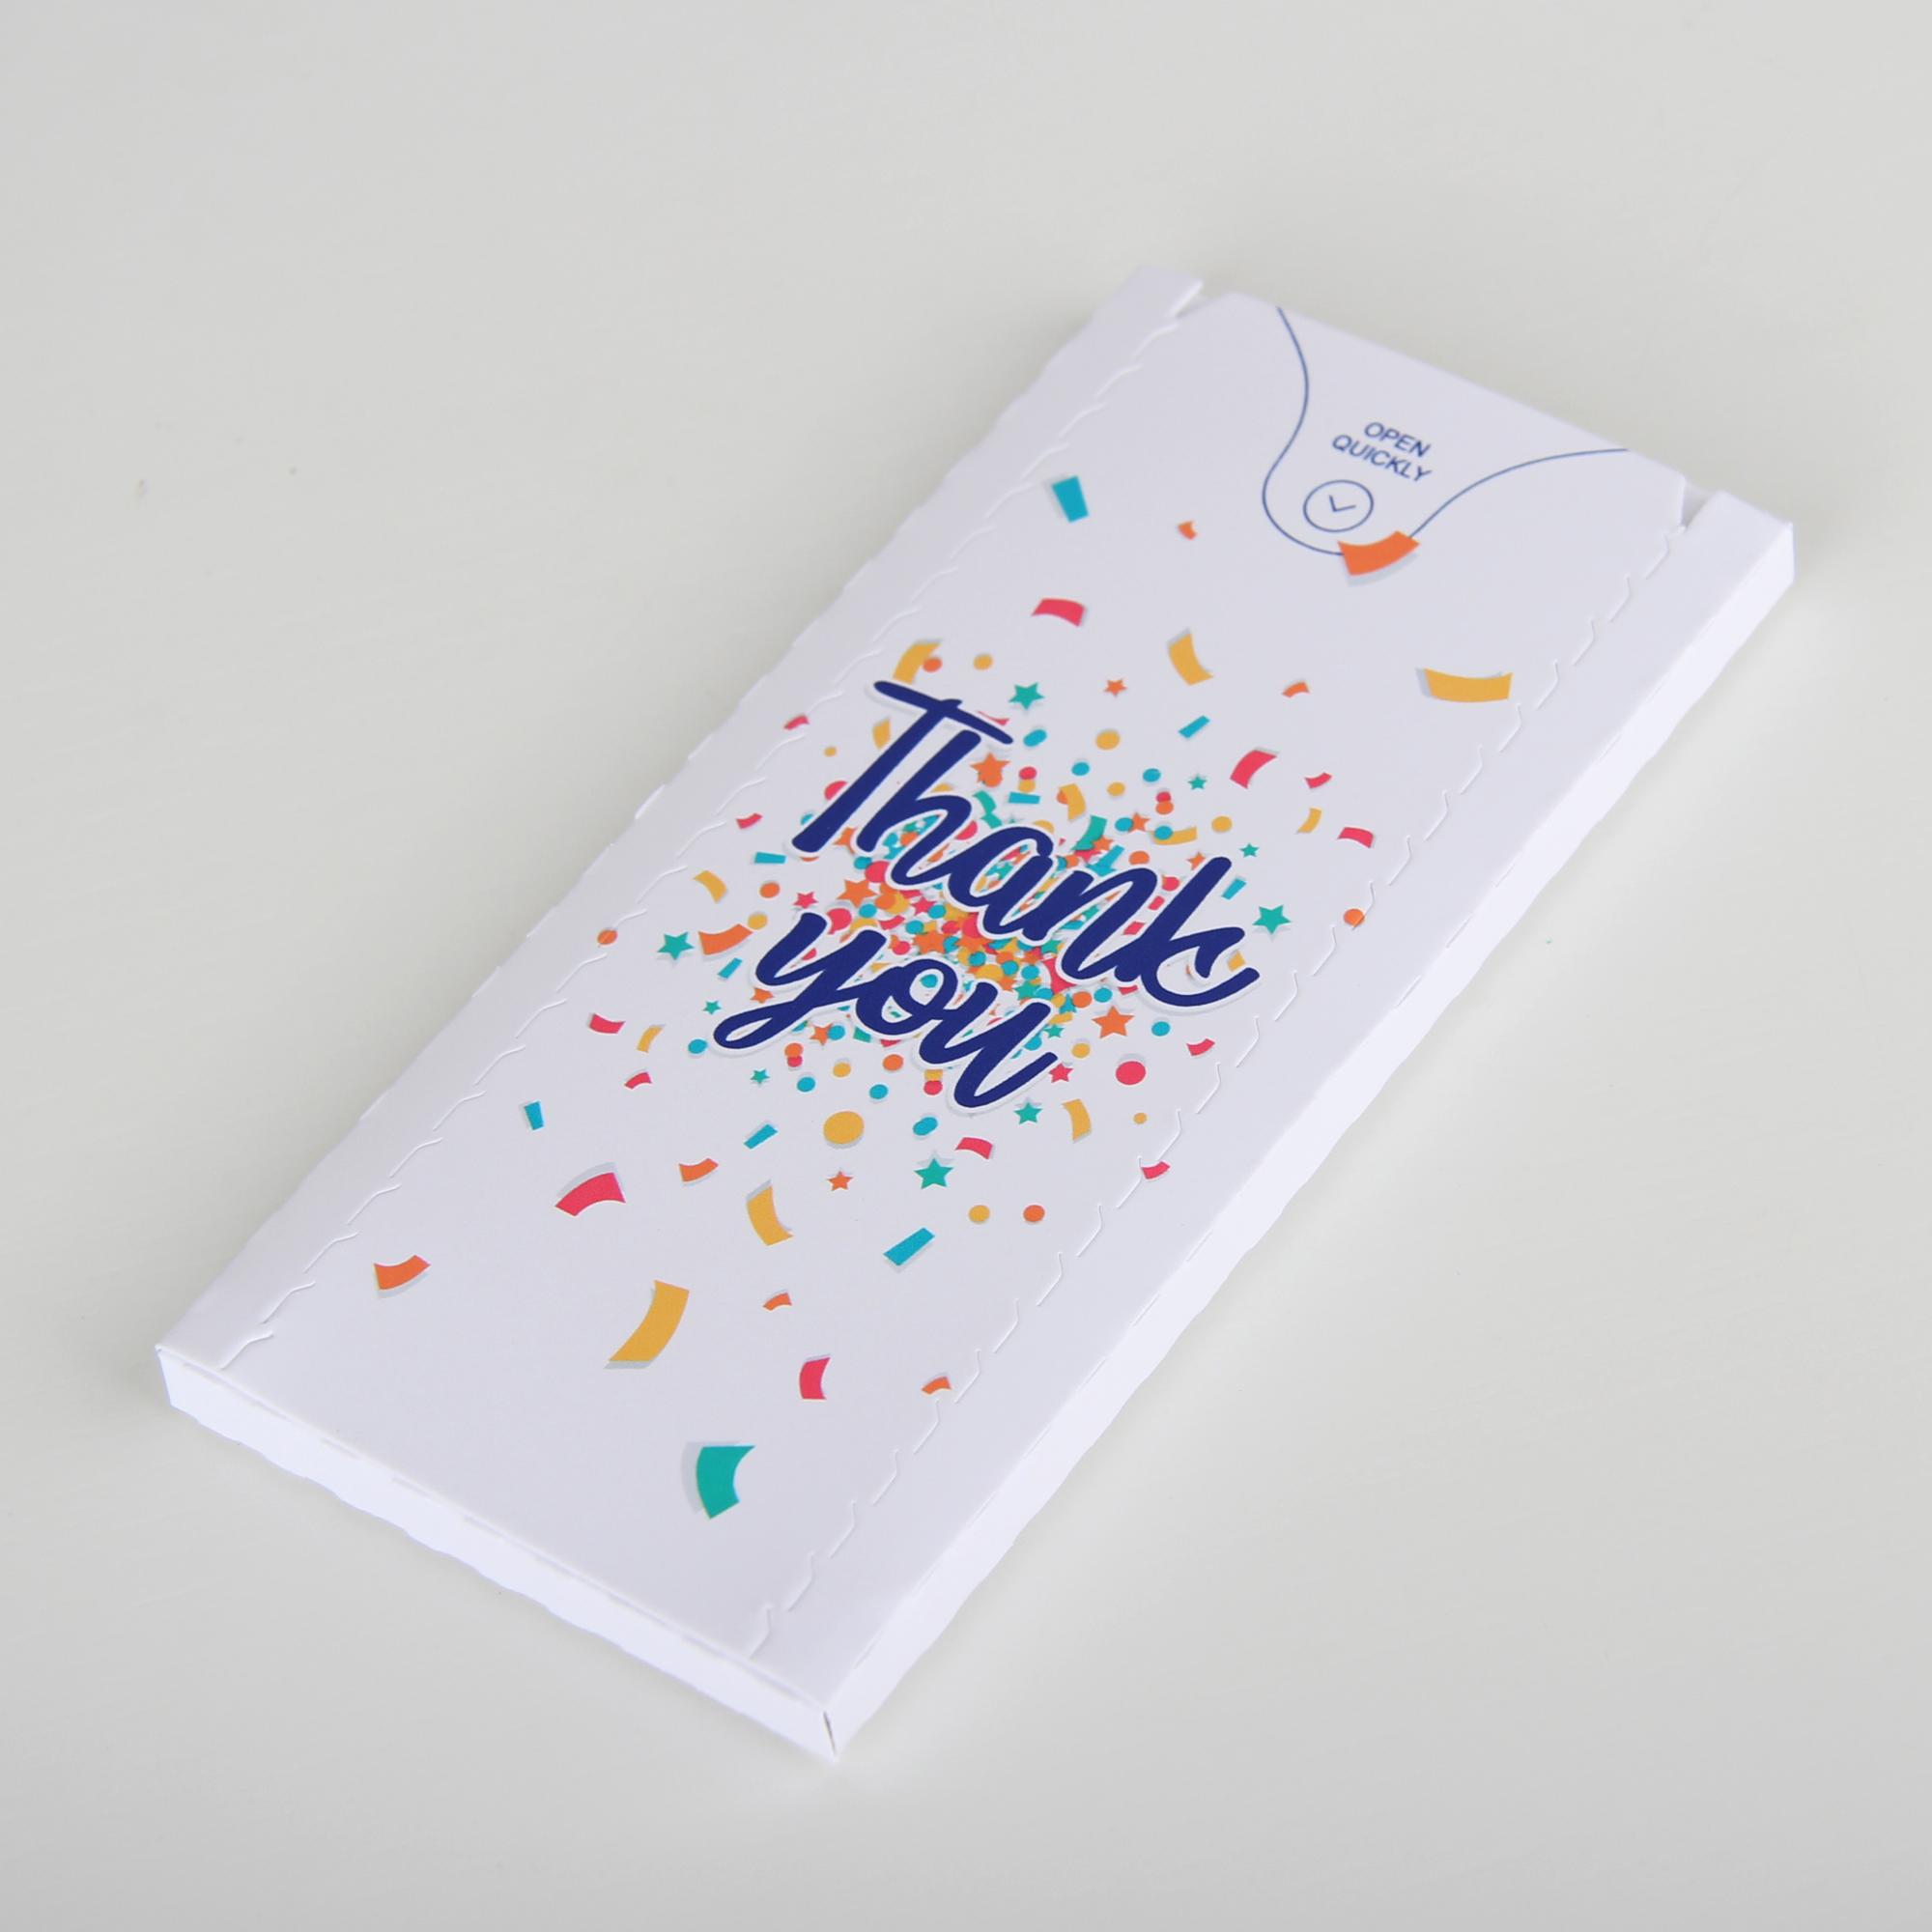 Boom card - Thank you